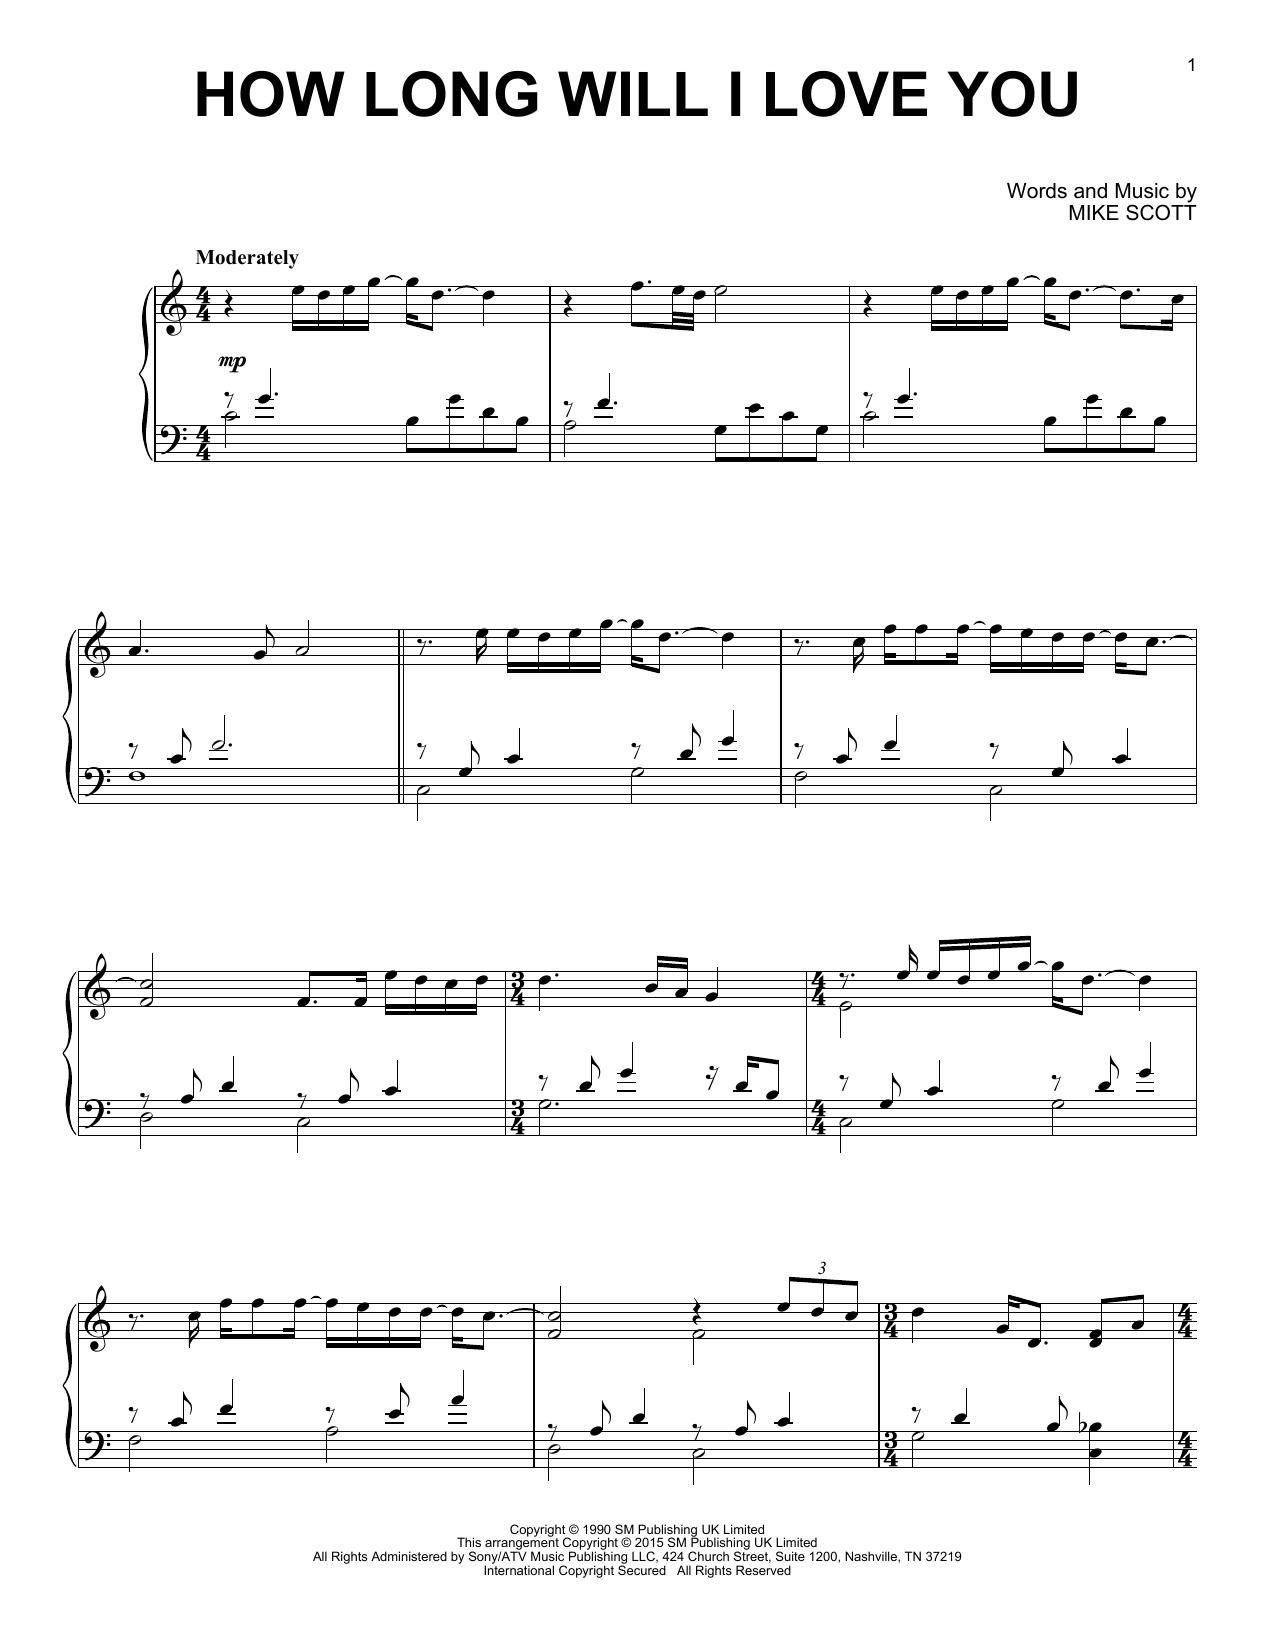 How Long Will I Love You Sheet Music